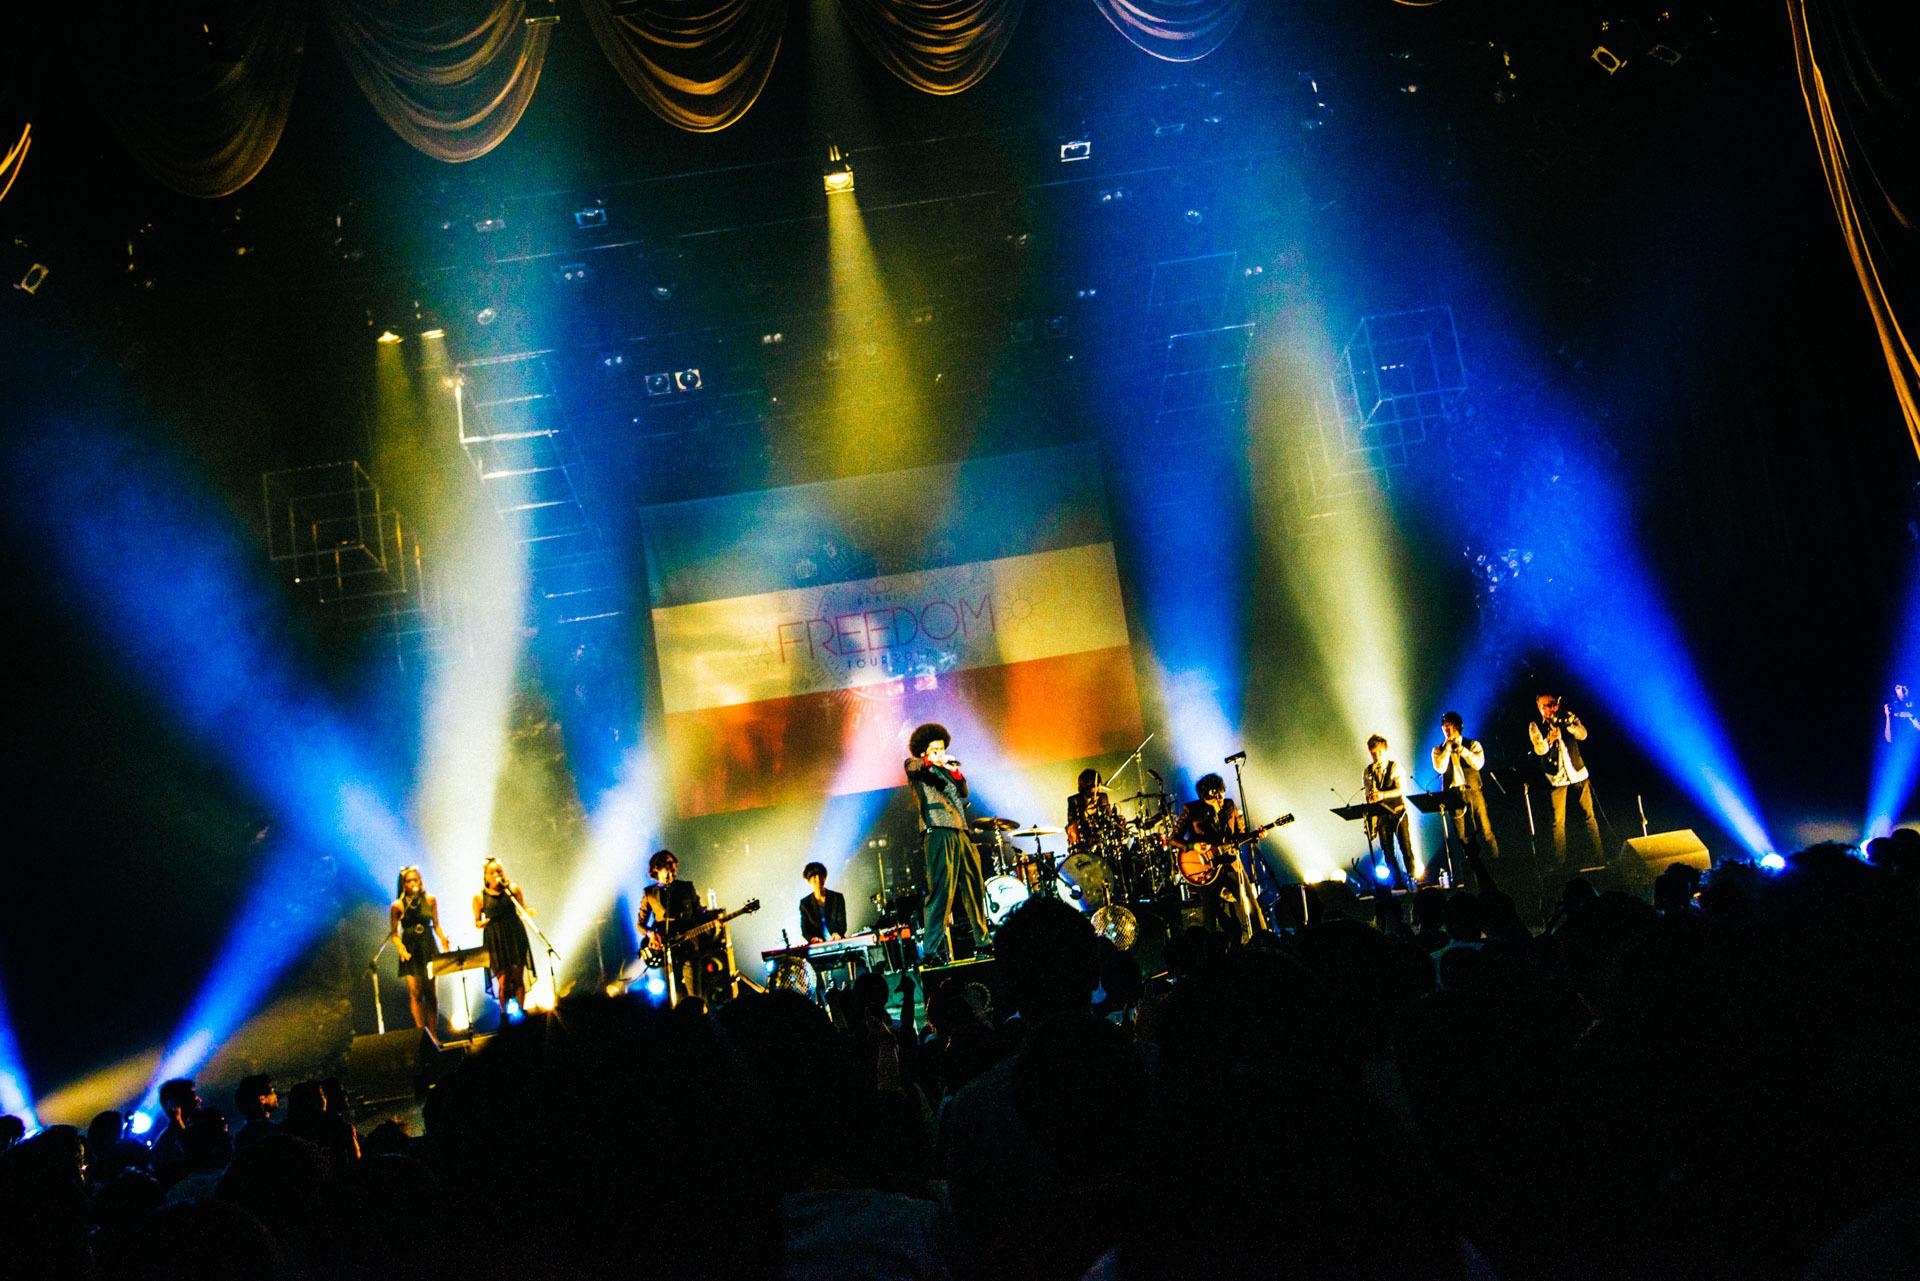 BRADIO『FREEDOM tour 2017』ファイナル公演